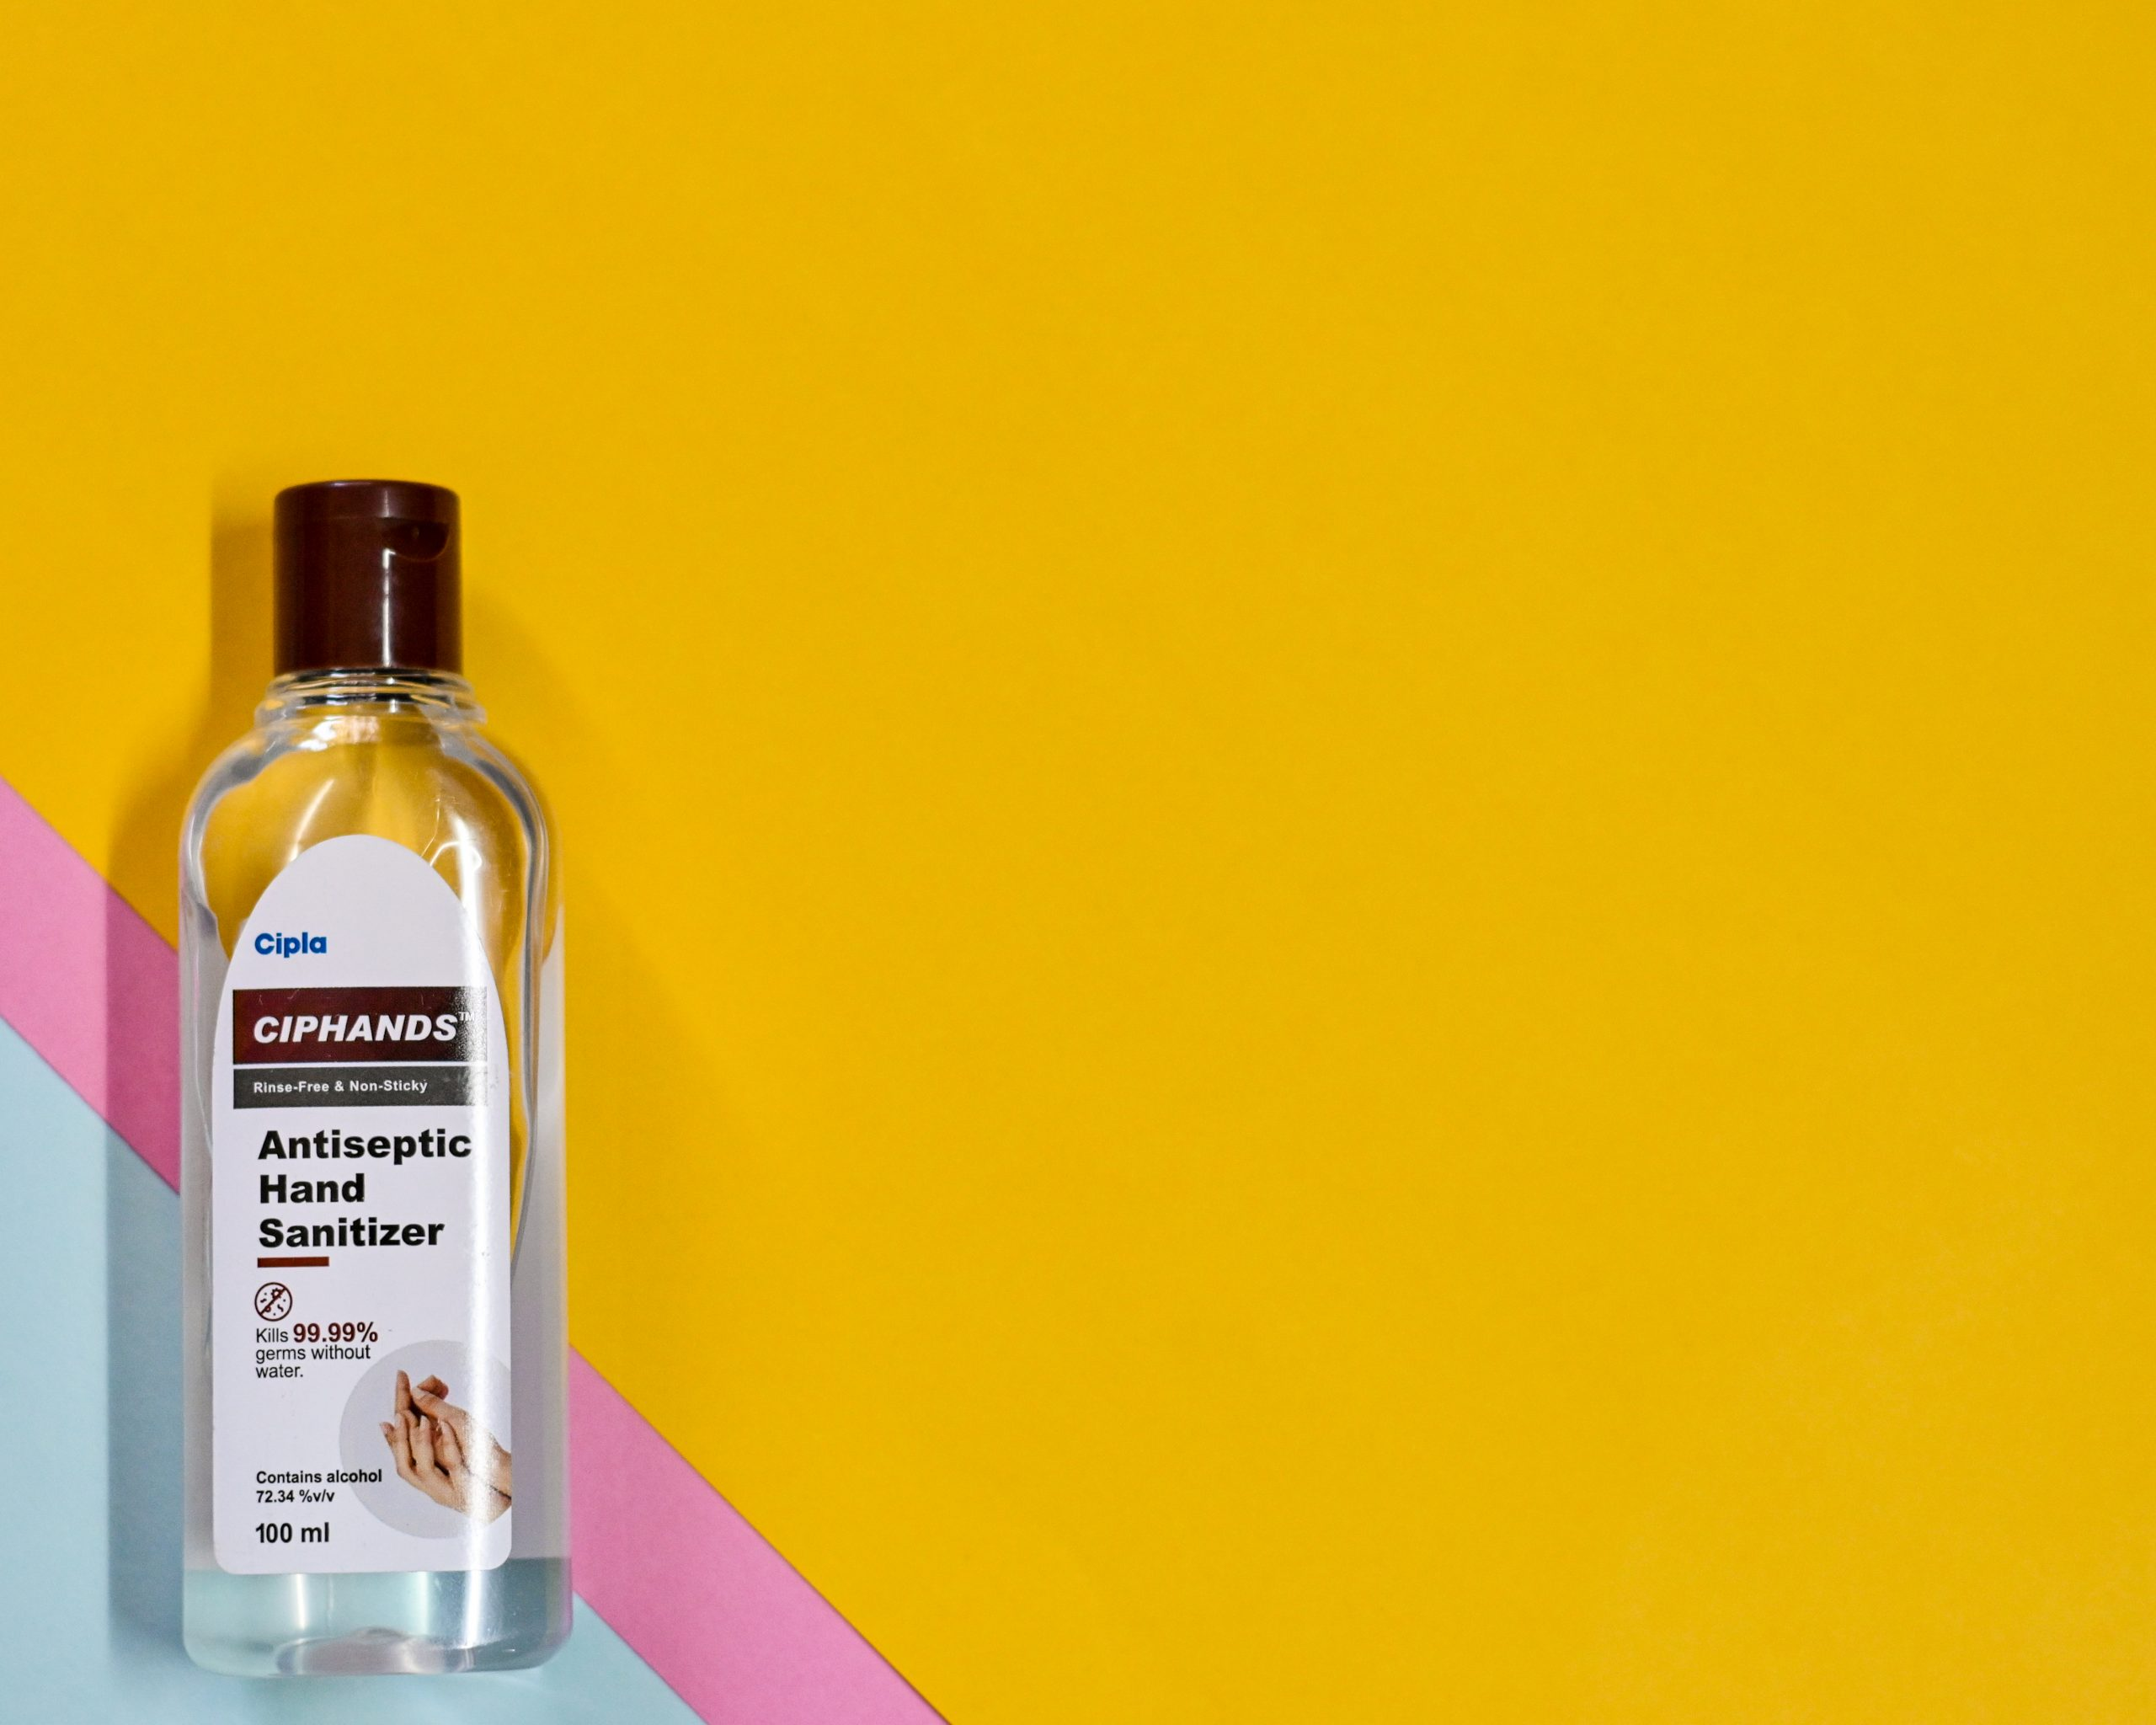 A bottle of hand sanitizer